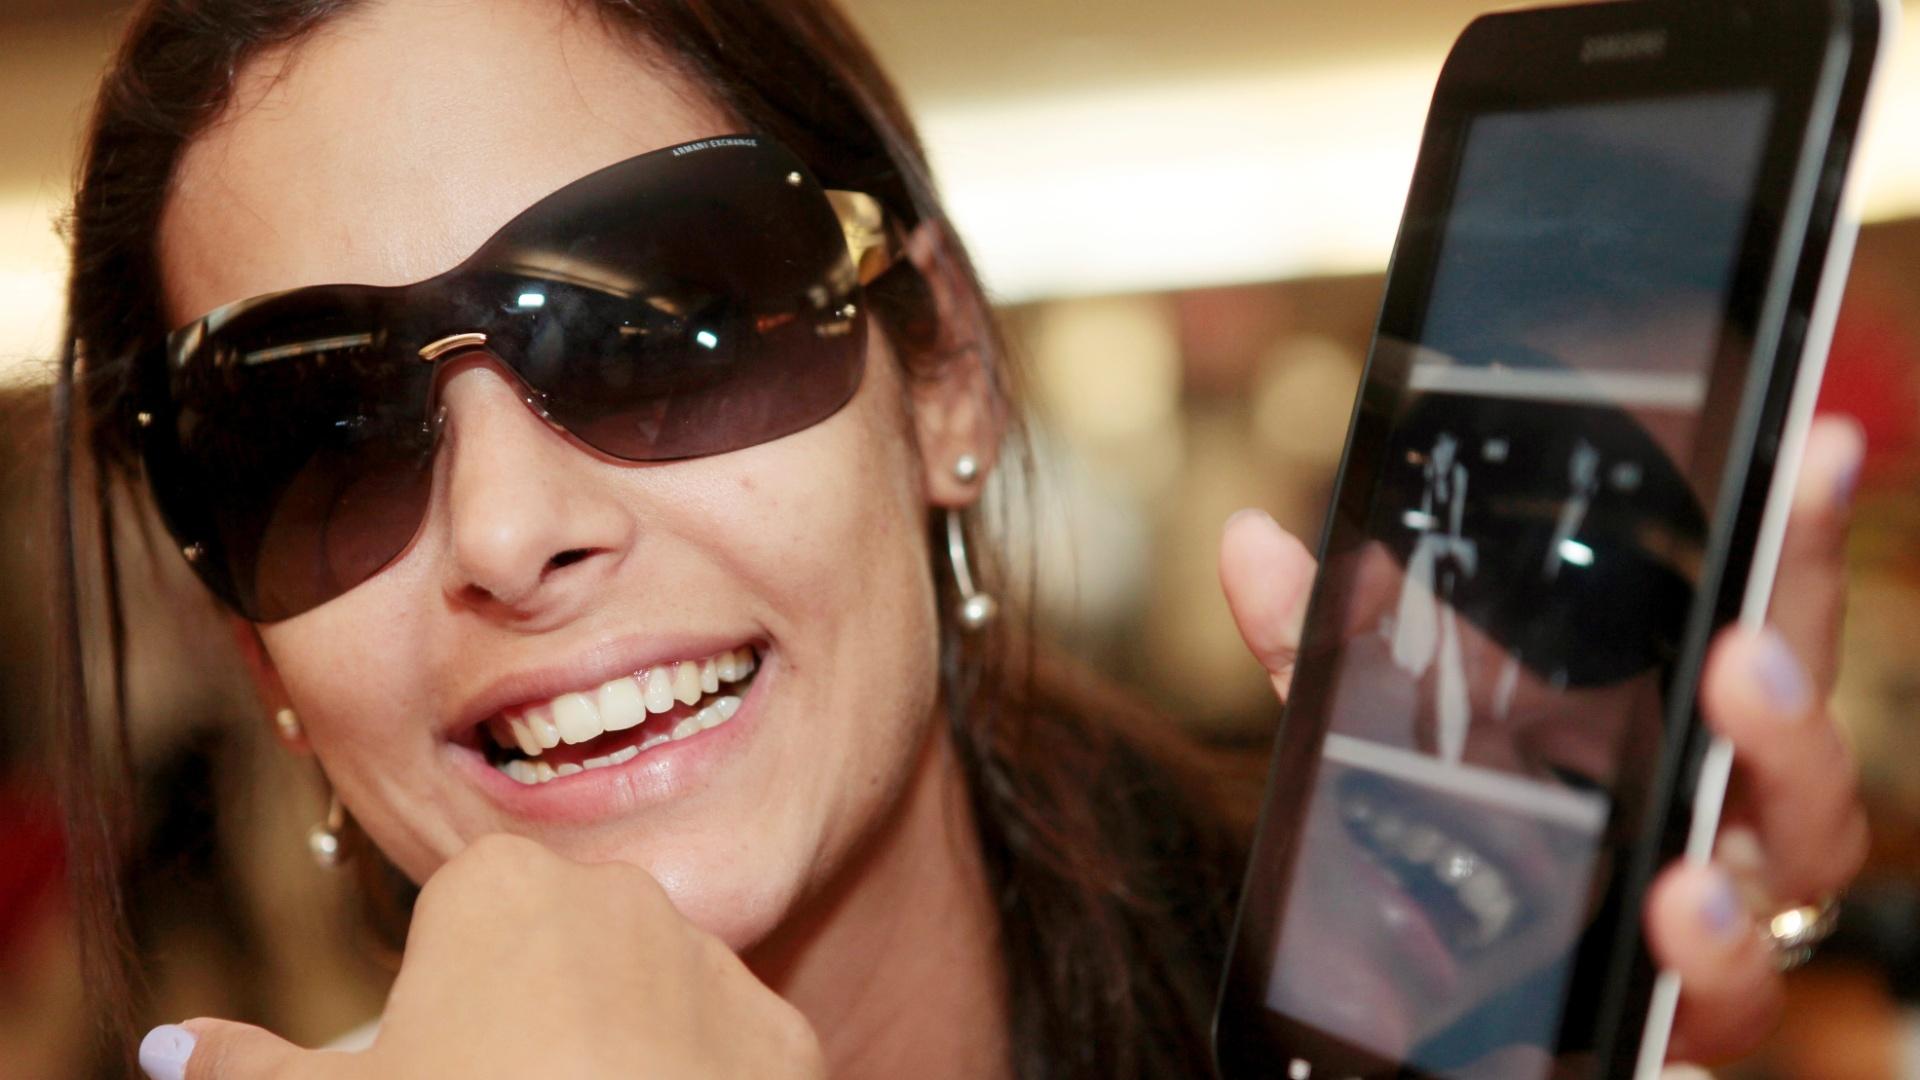 Larissa Riquelme sorri durante entrevista ao UOL Esporte, no aeroporto de Guarulhos